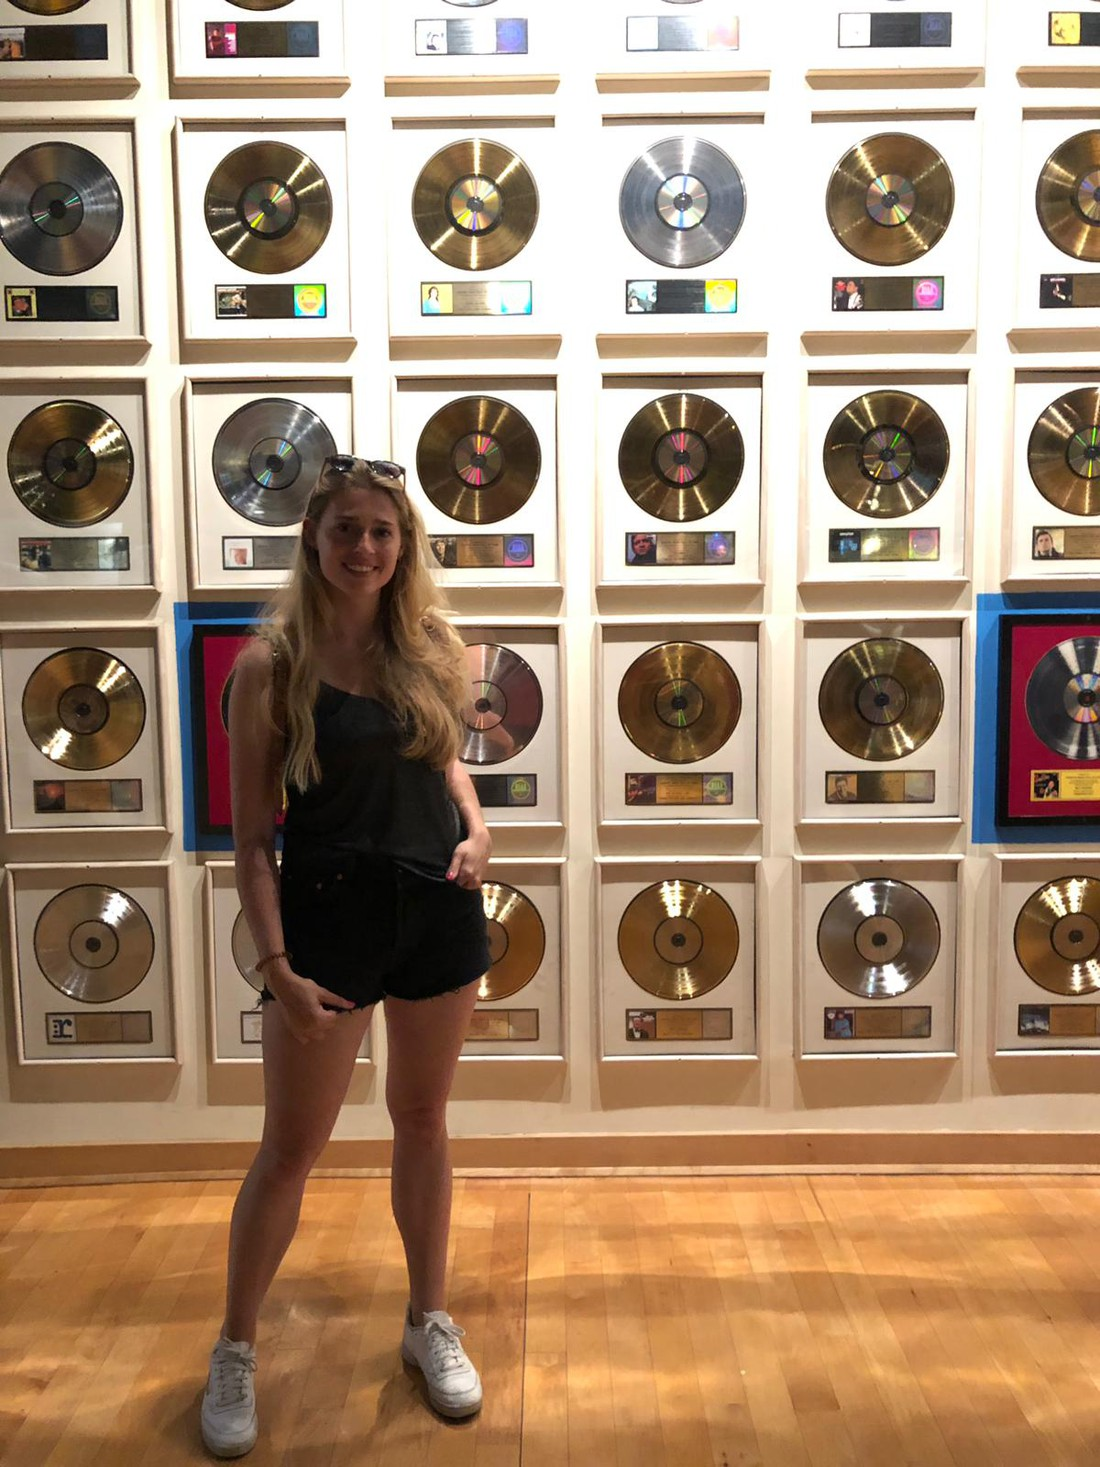 Country Music Hall of Fame - Nashville - Tennessee - Amerika - Doets Reizen